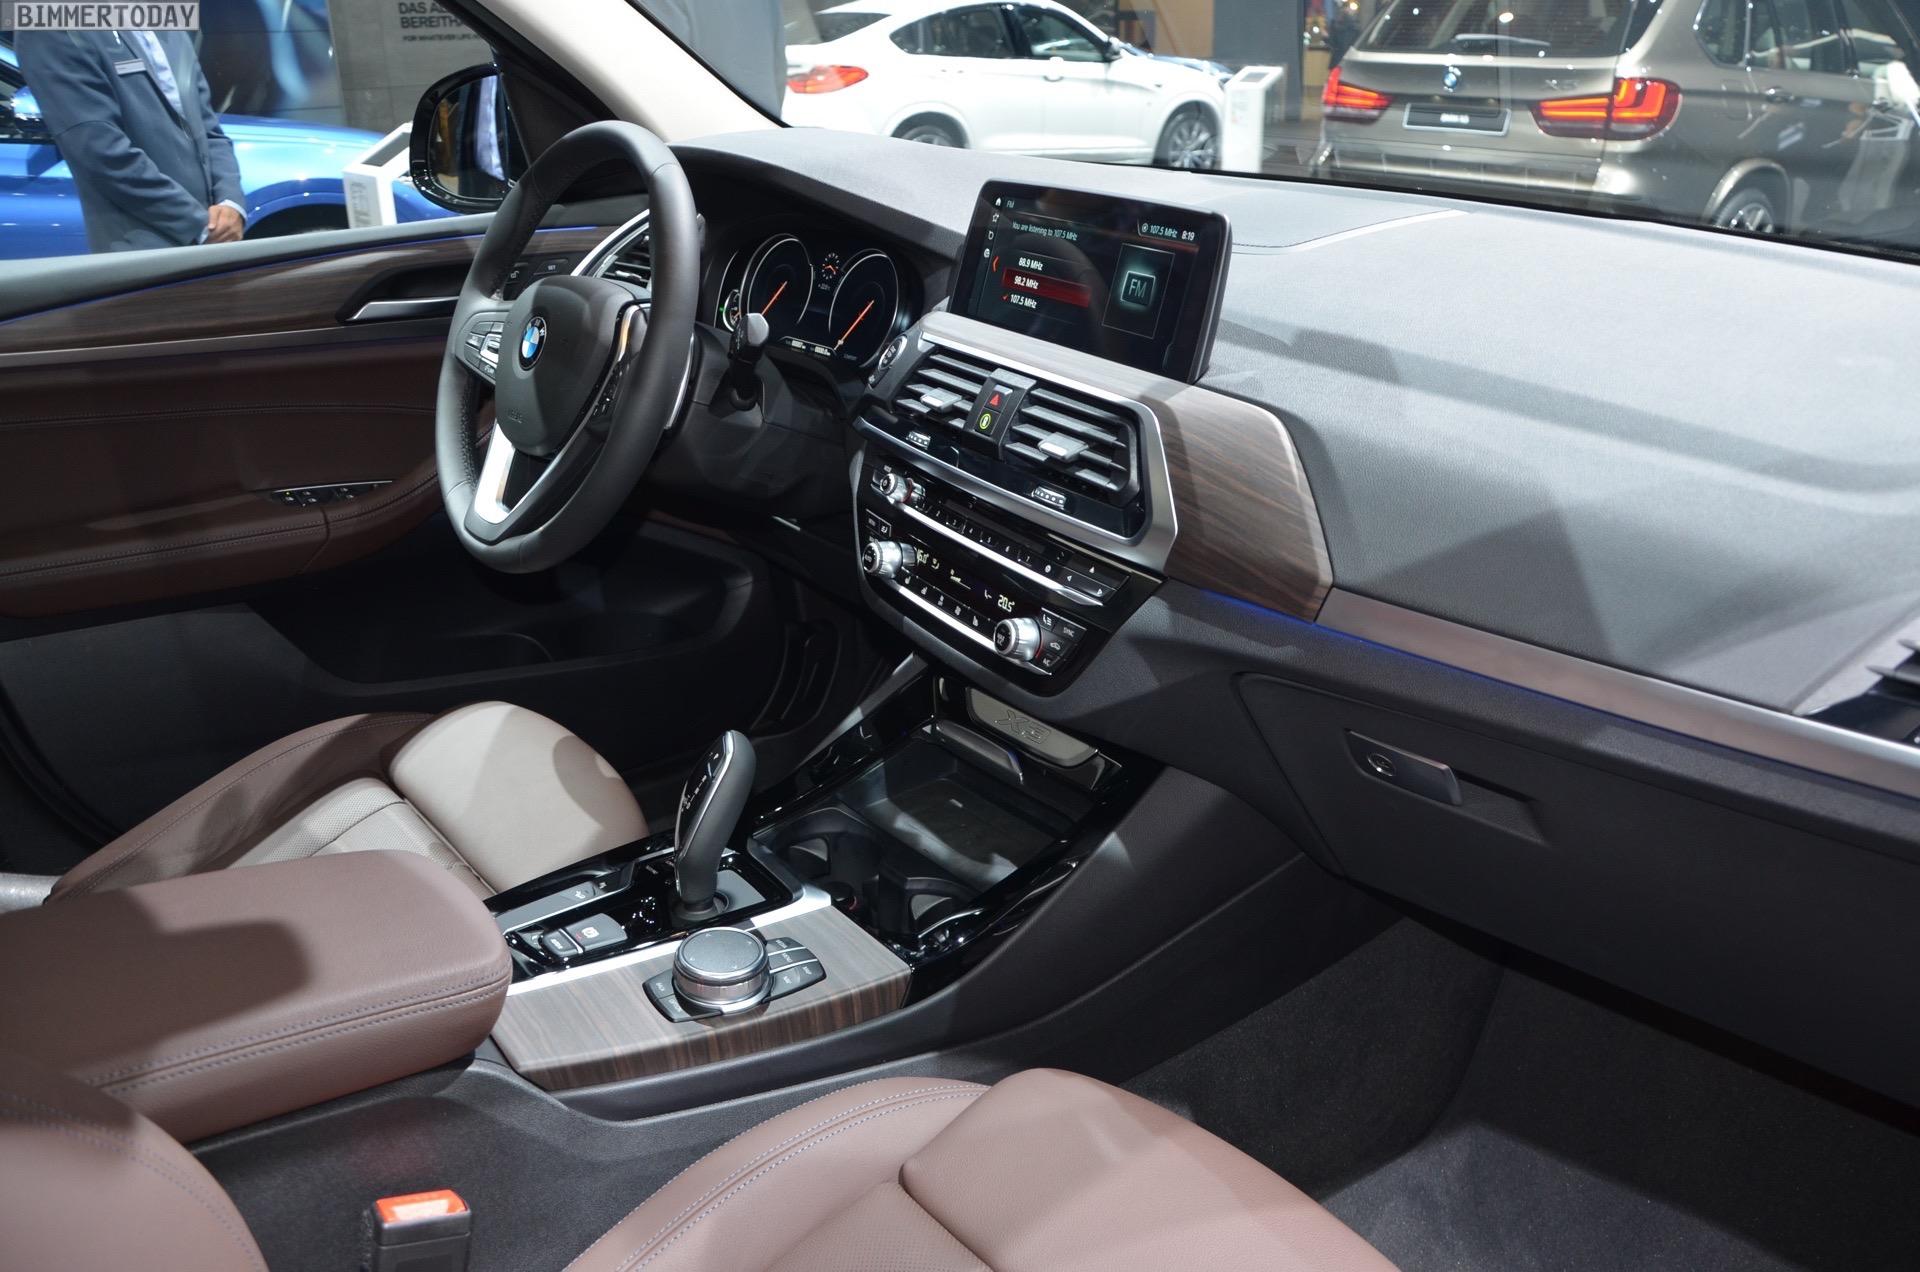 https://cdn.bimmertoday.de/wp-content/uploads/2017/09/IAA-2017-BMW-X3-G01-xDrive30d-xLine-Sophistograu-Interieur-Live-08.jpg